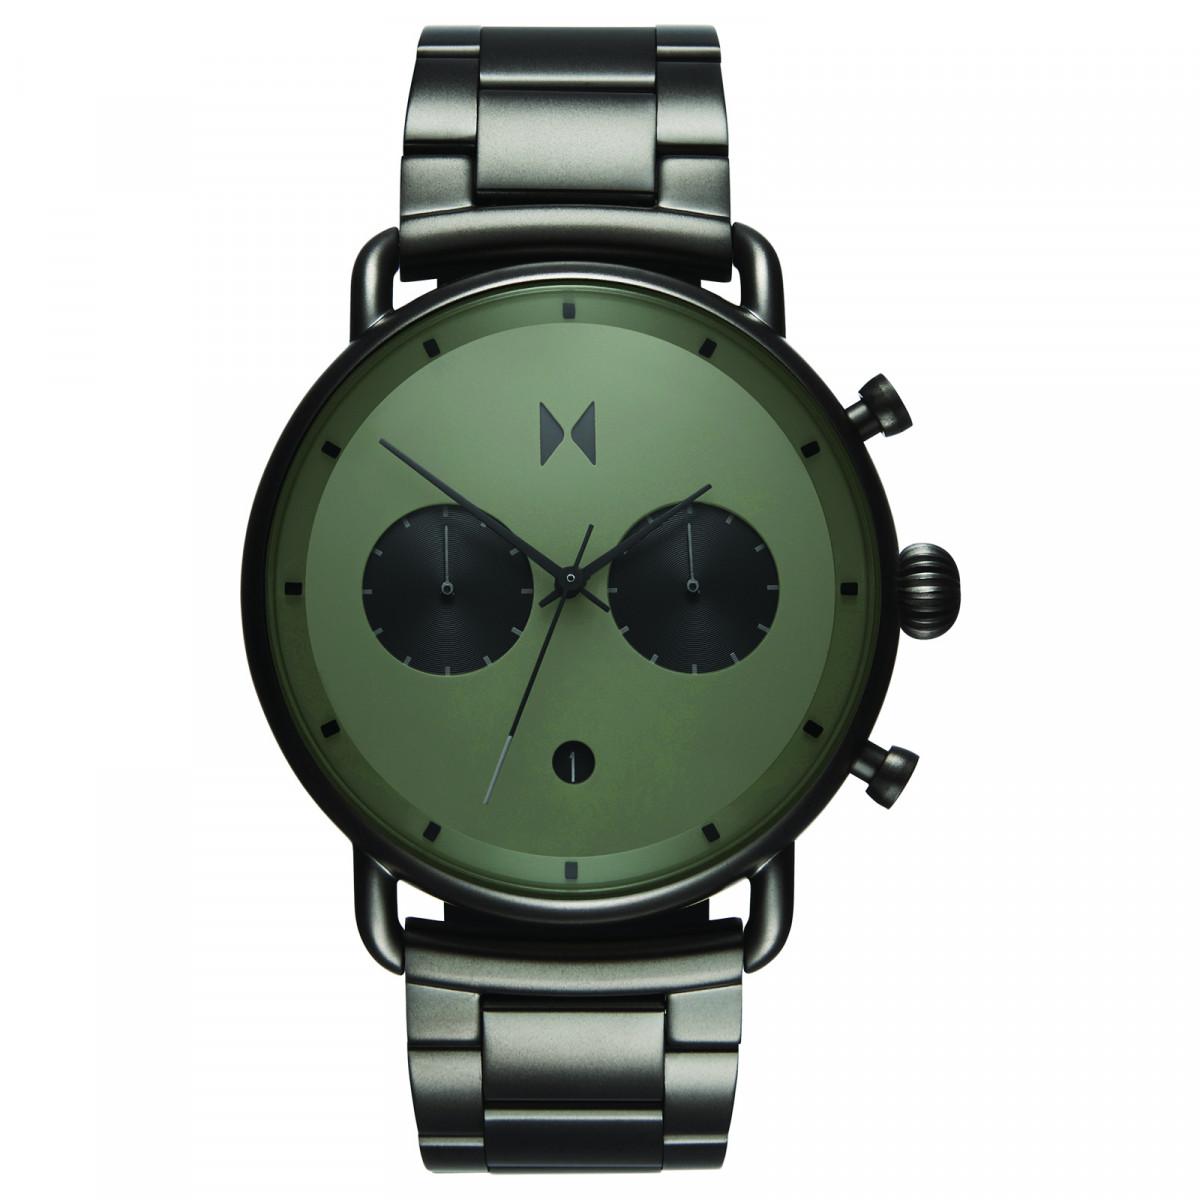 mvmt-blacktop-rally-green-gunmetal-bt01-olgu-ferfi-karora_7a7630ed8b6264957c90987afad233fb.jpg